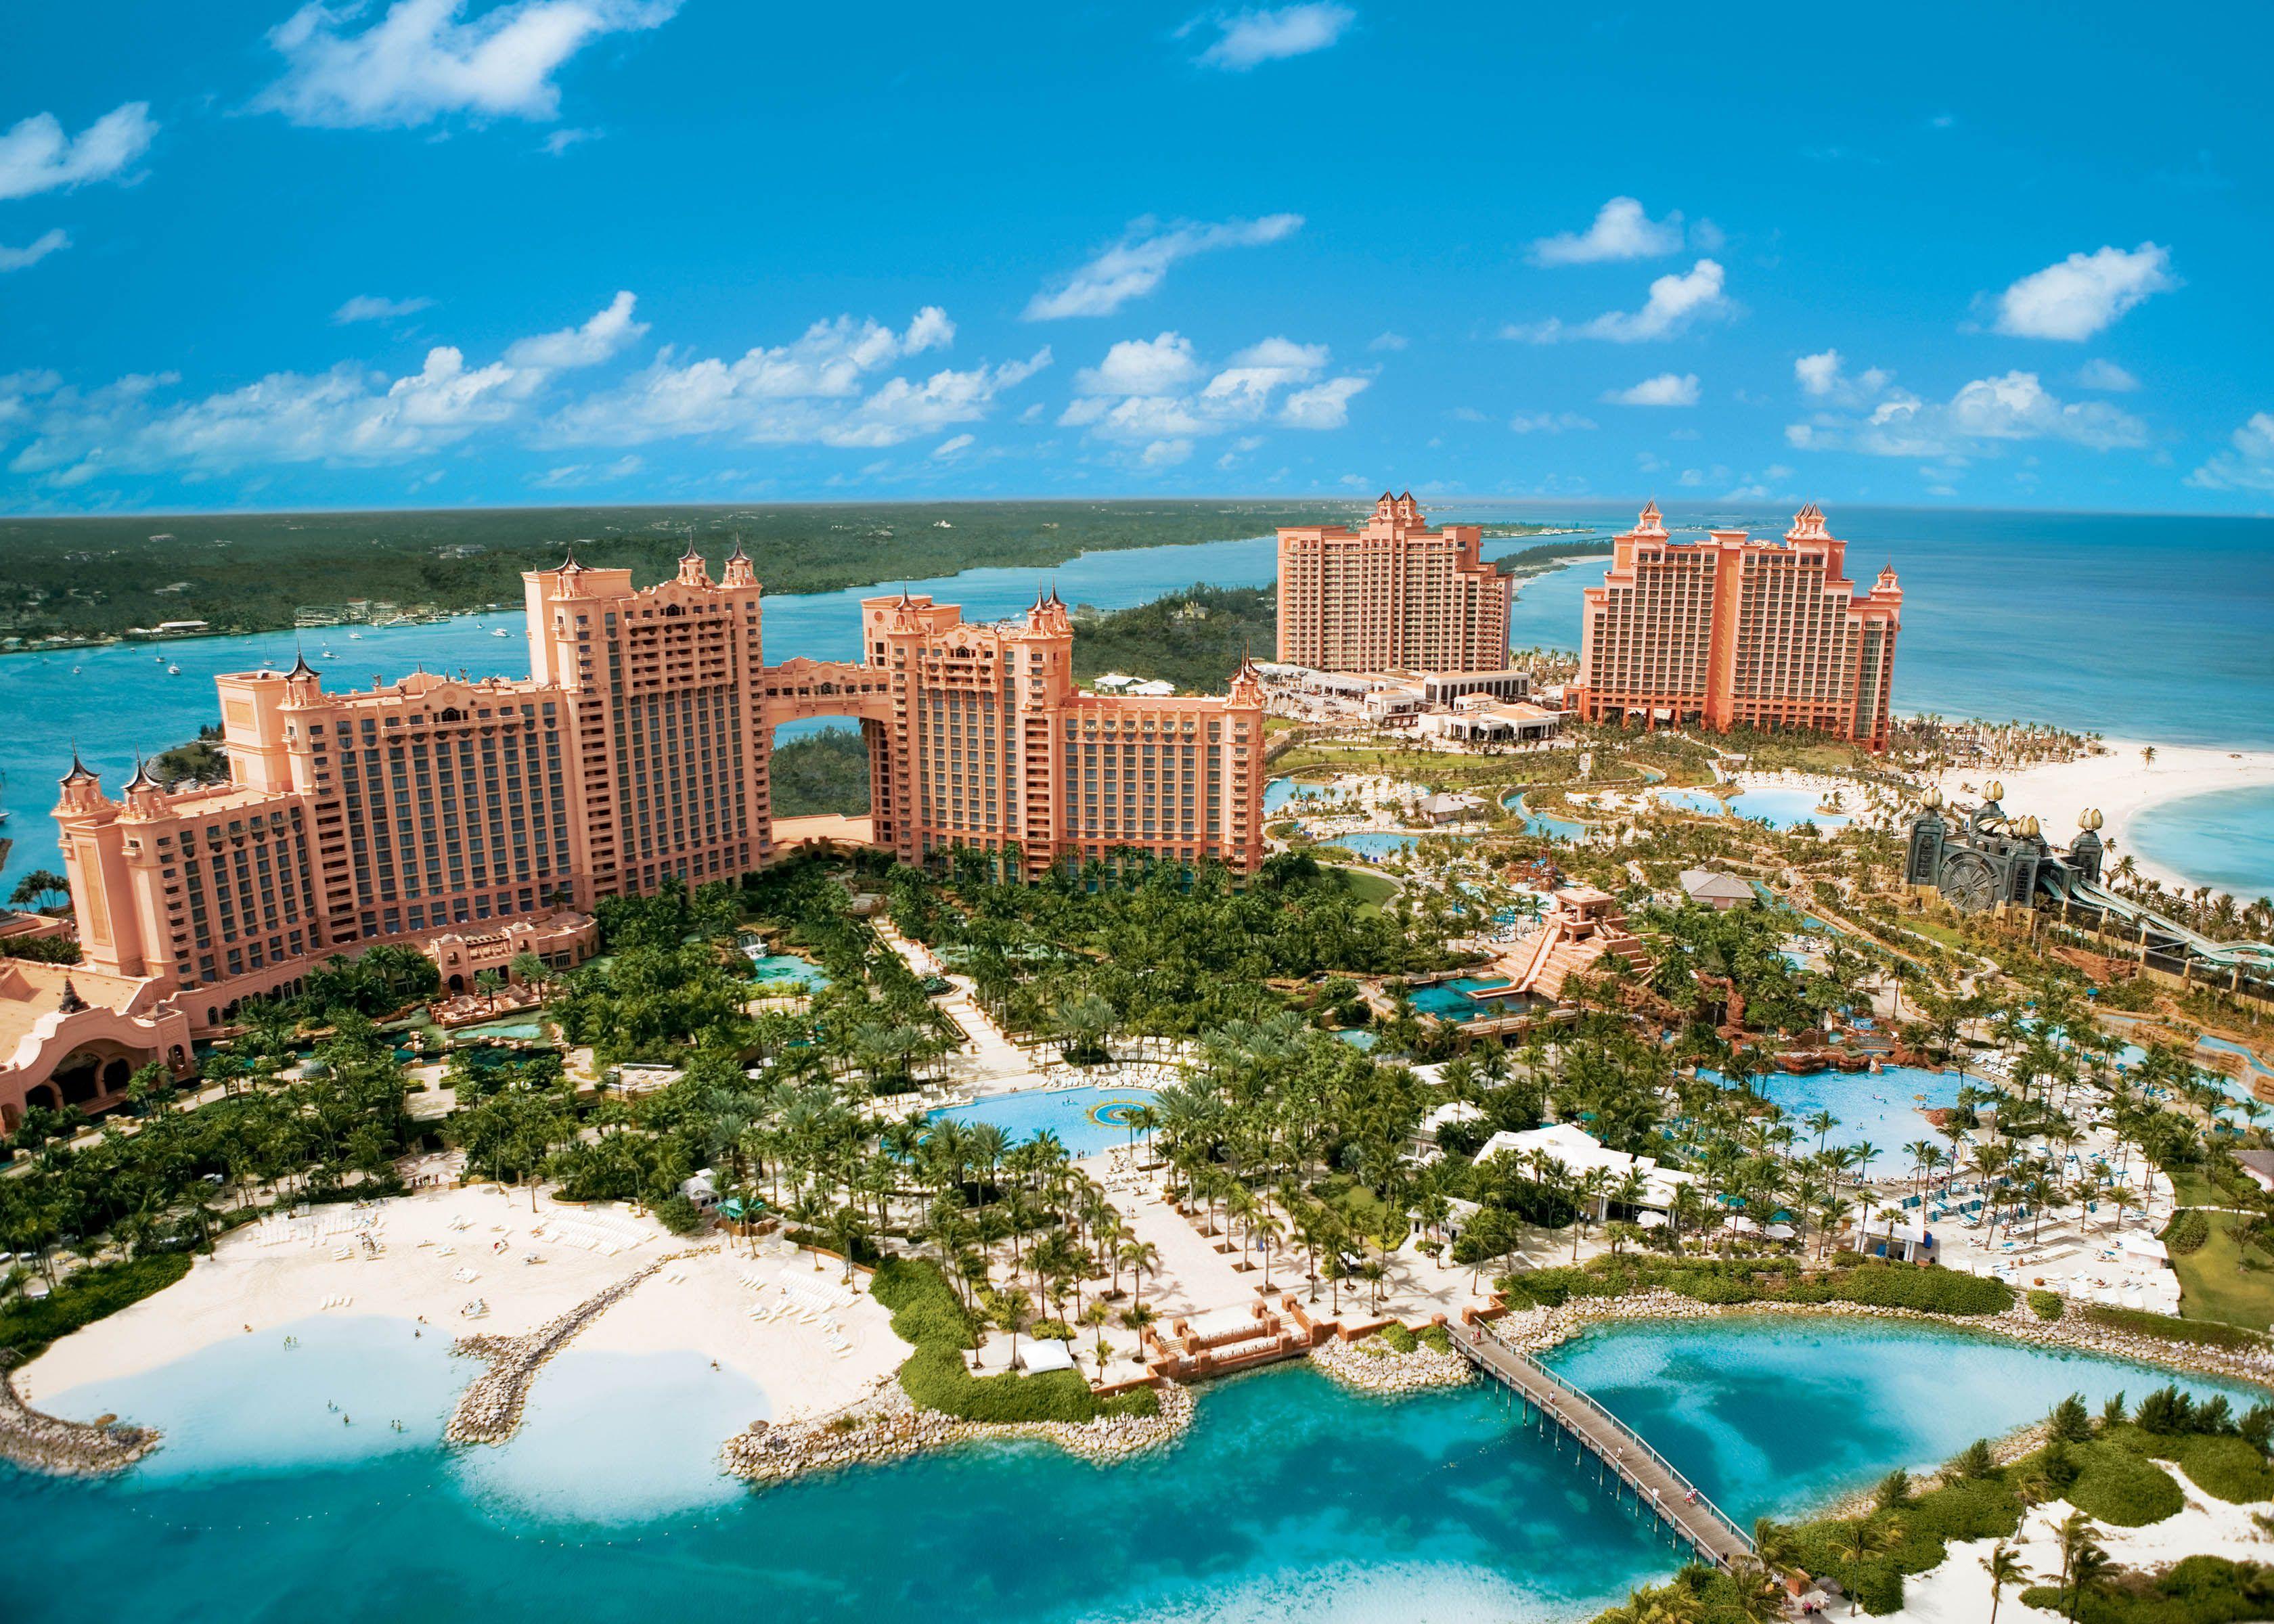 Nassau Bahamas Spring Break Destination